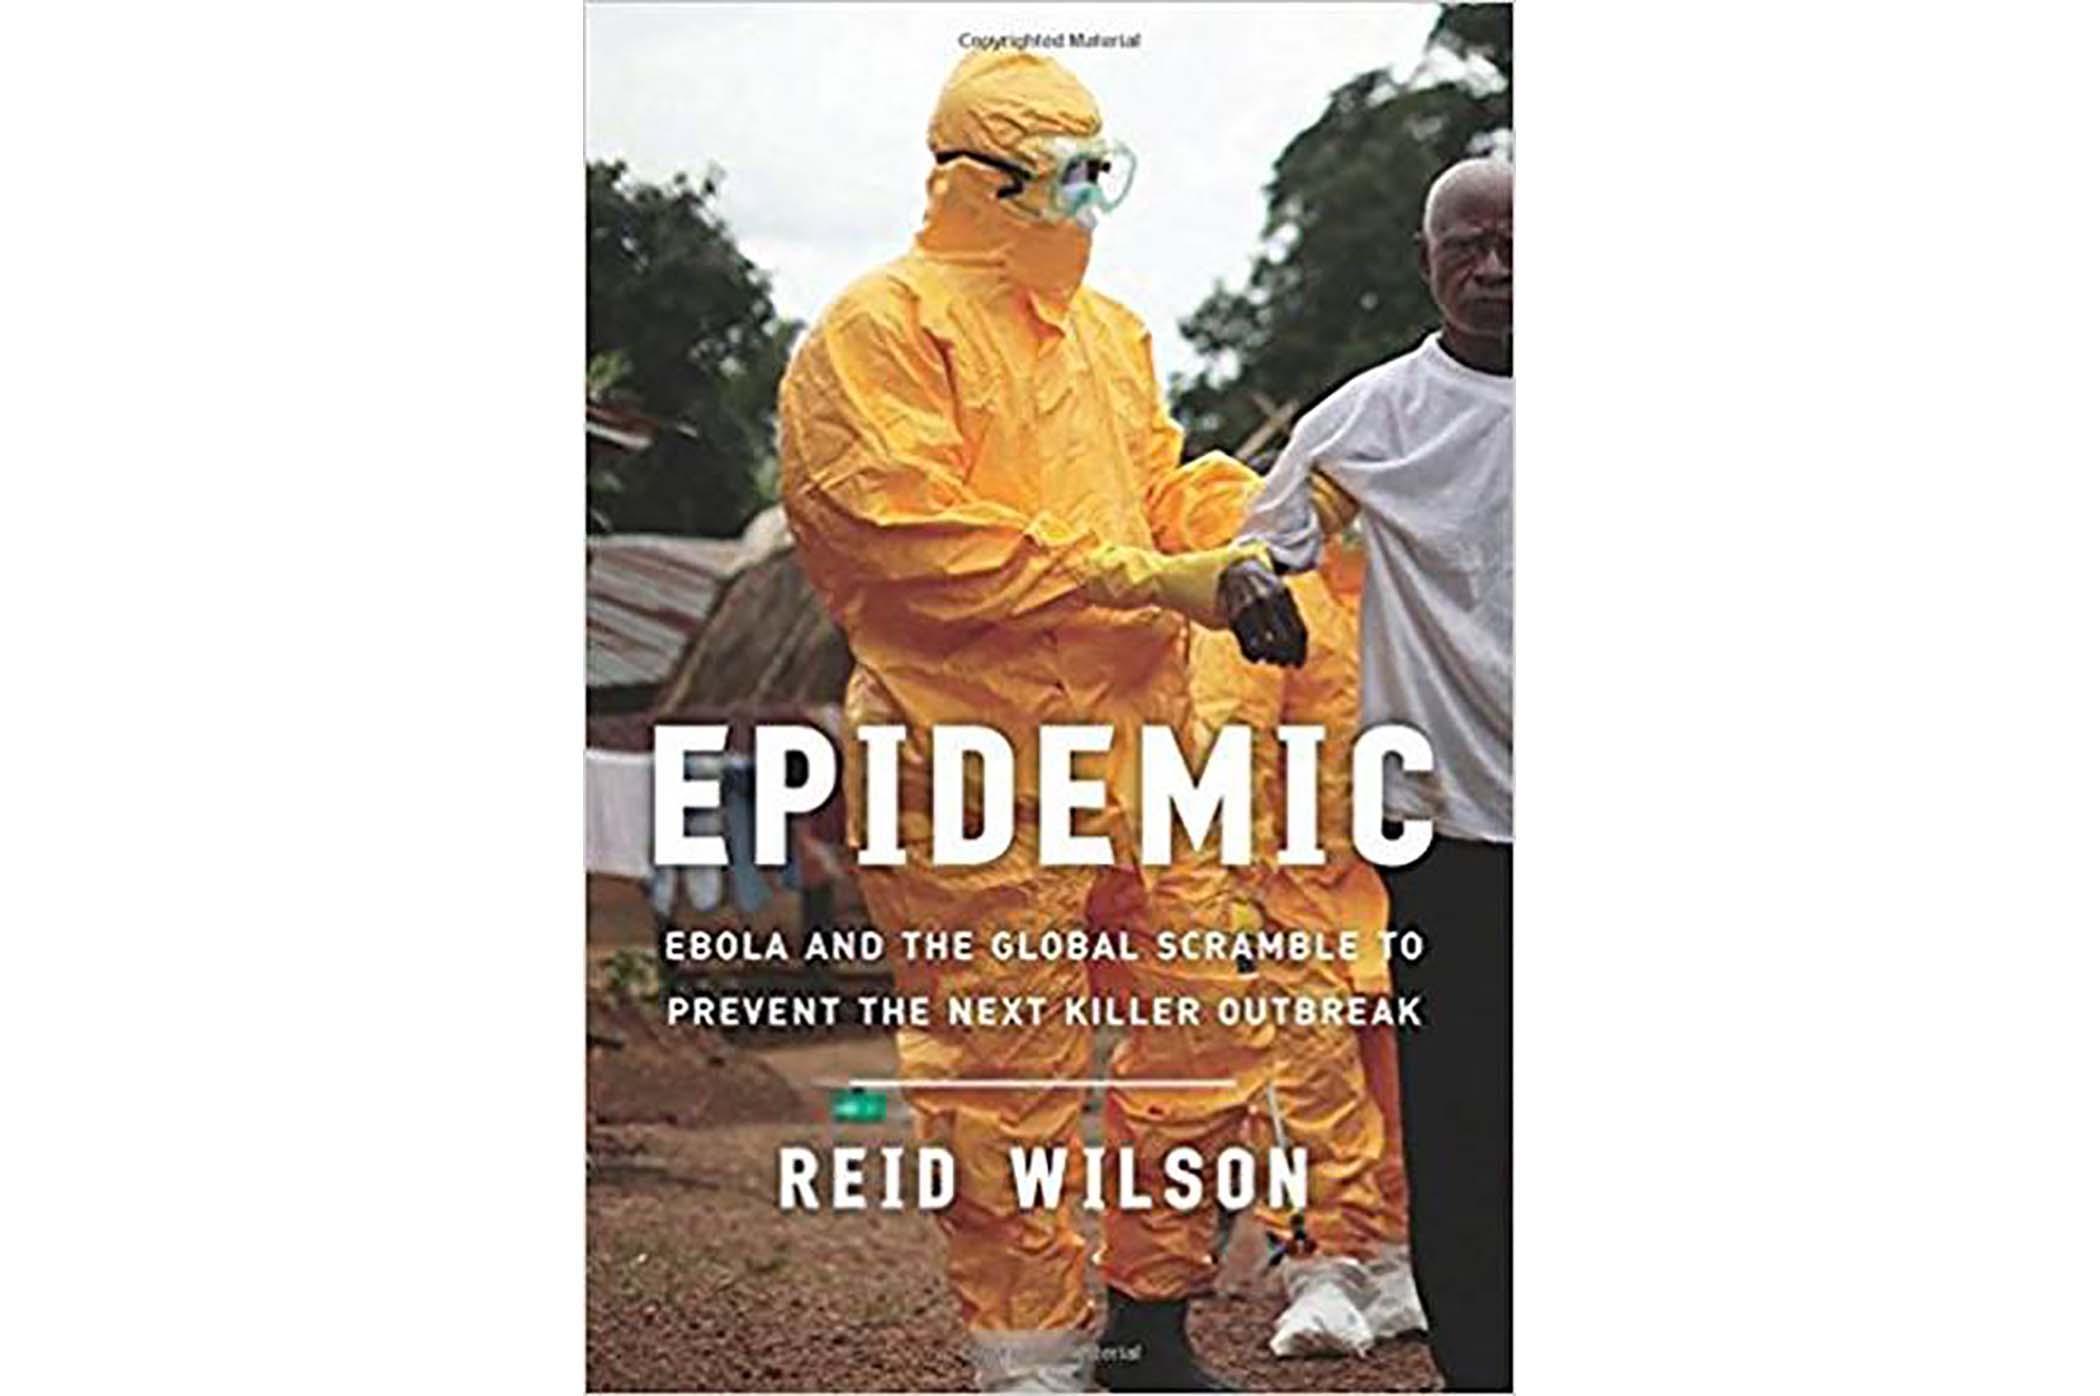 Epidemichero